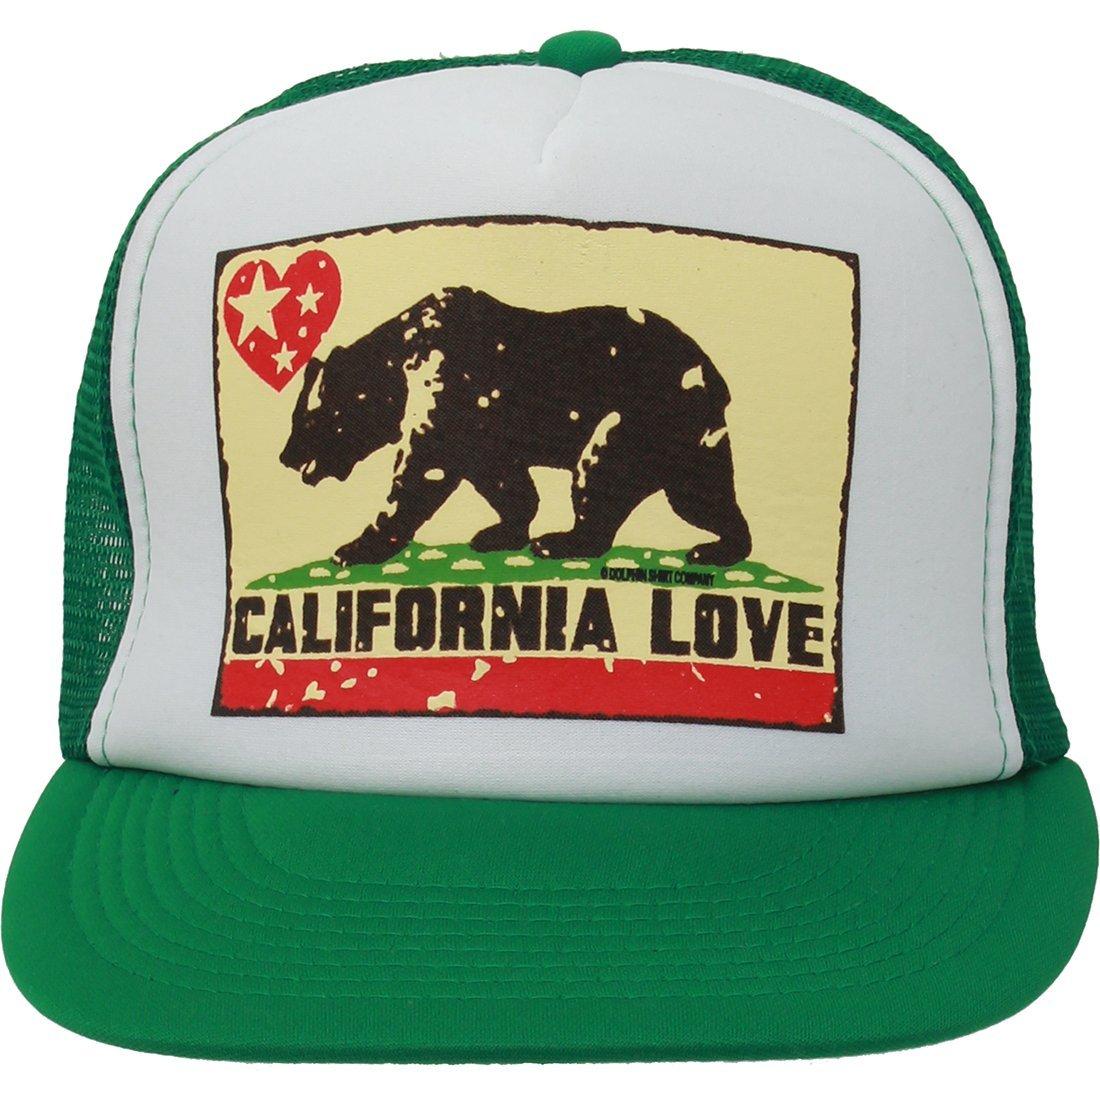 California Love Flag Flat Bill Snapback Mesh Truckers Cap - Black White One  Size Fits Most at Amazon Women s Clothing store  0940b34b078